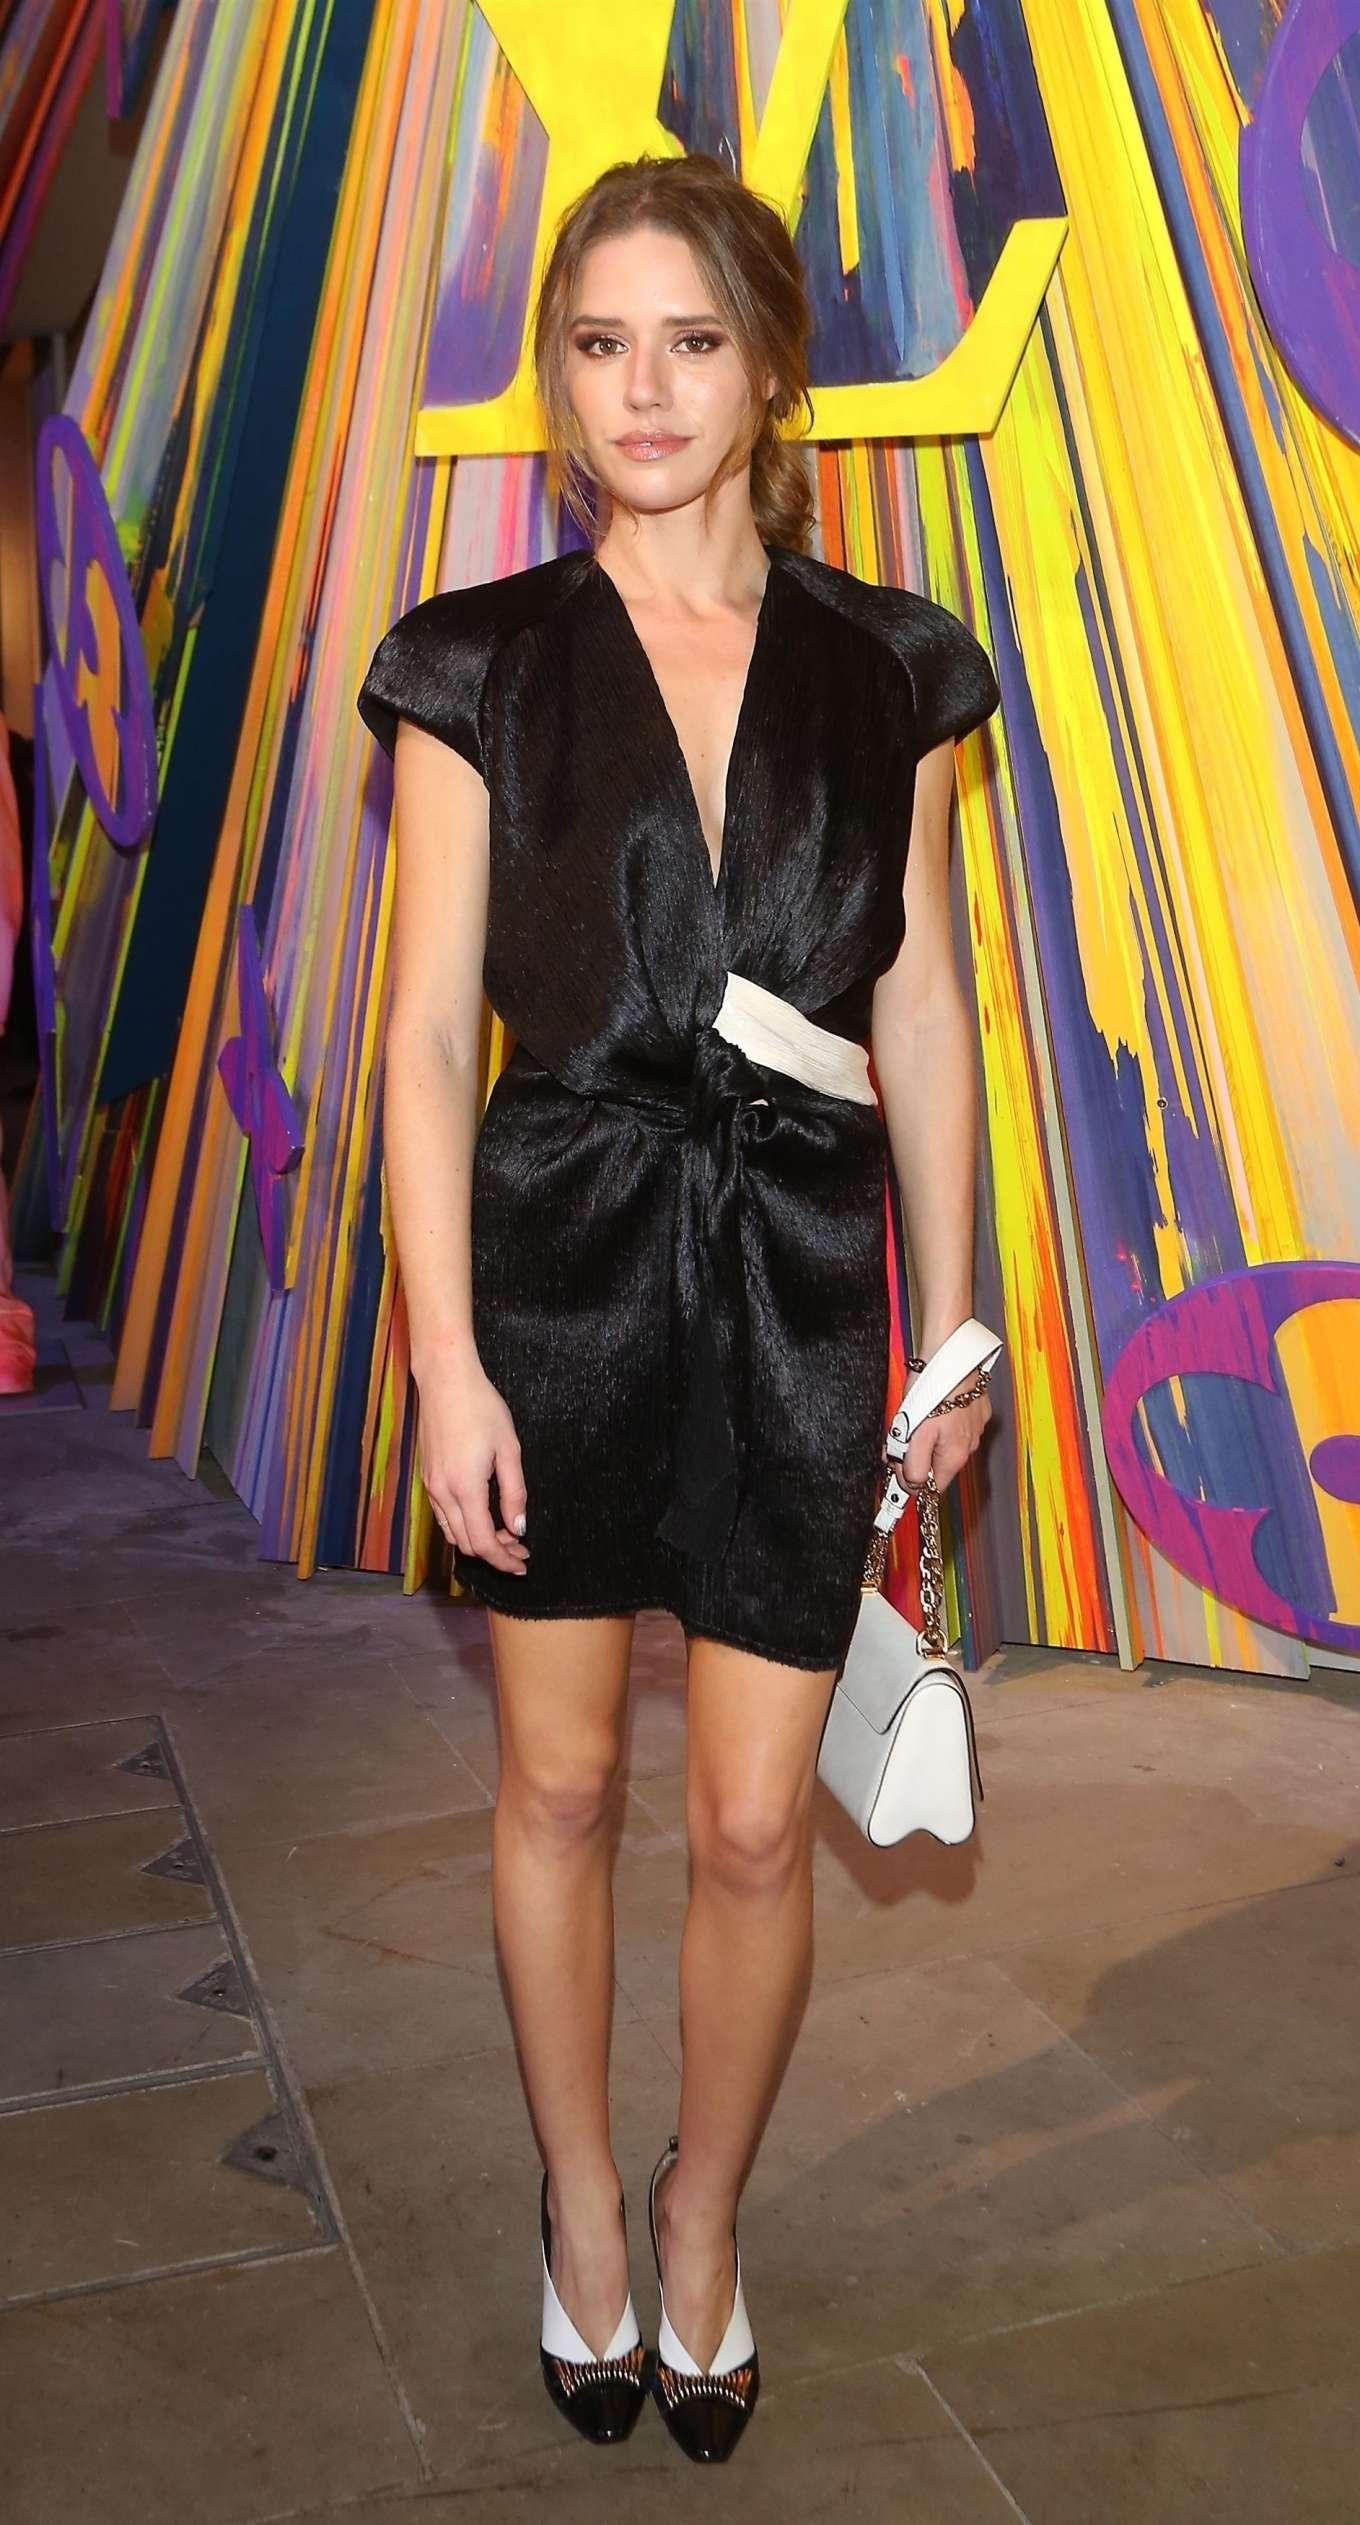 Alessandra Balazs 2019 : Alessandra Balazs – Louis Vuitton Maison Store Launch Party-04